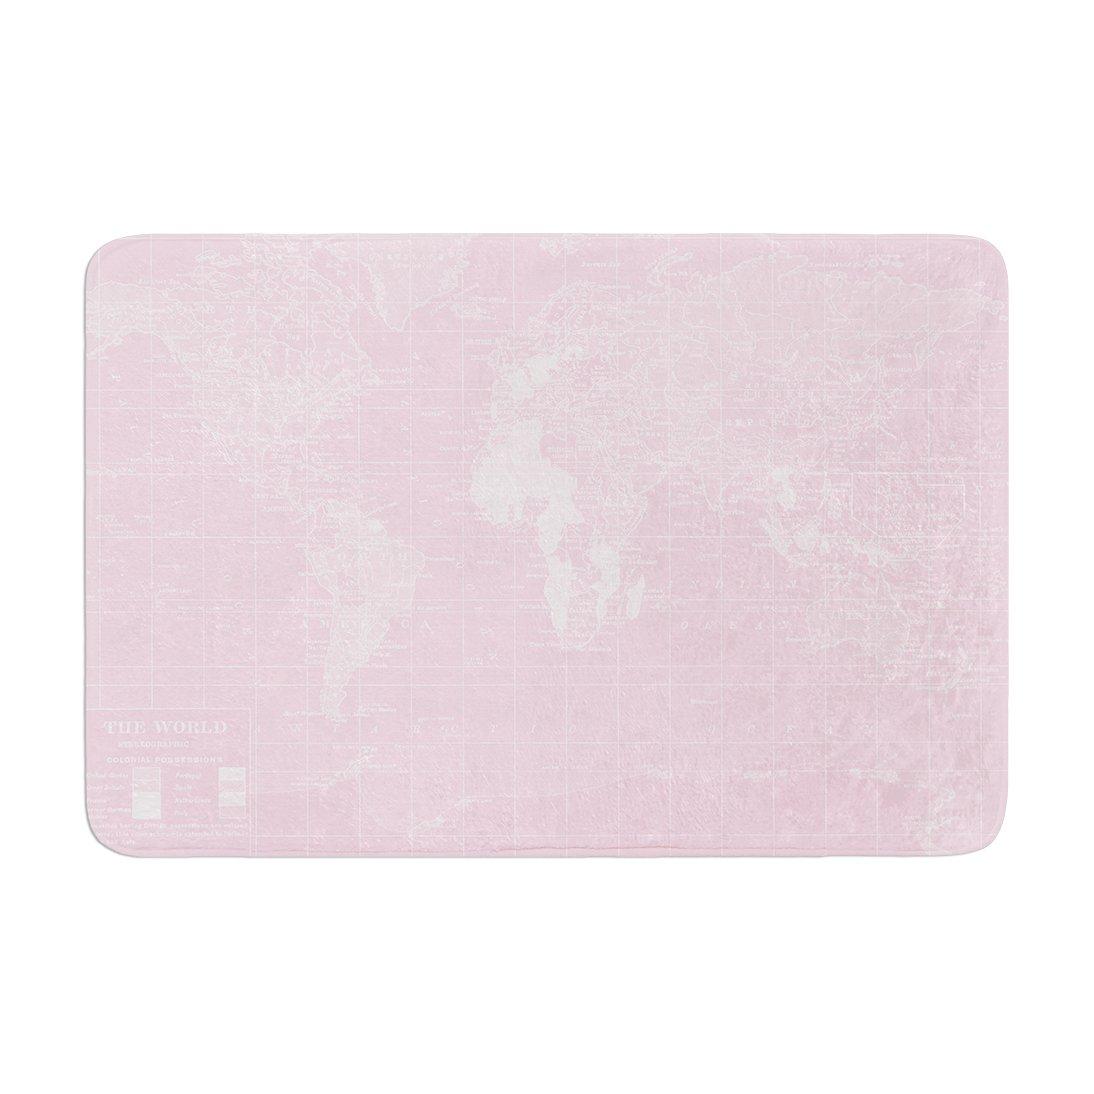 Kess InHouse Catherine Holcombe Her World Memory Foam Bath Mat 17 by 24